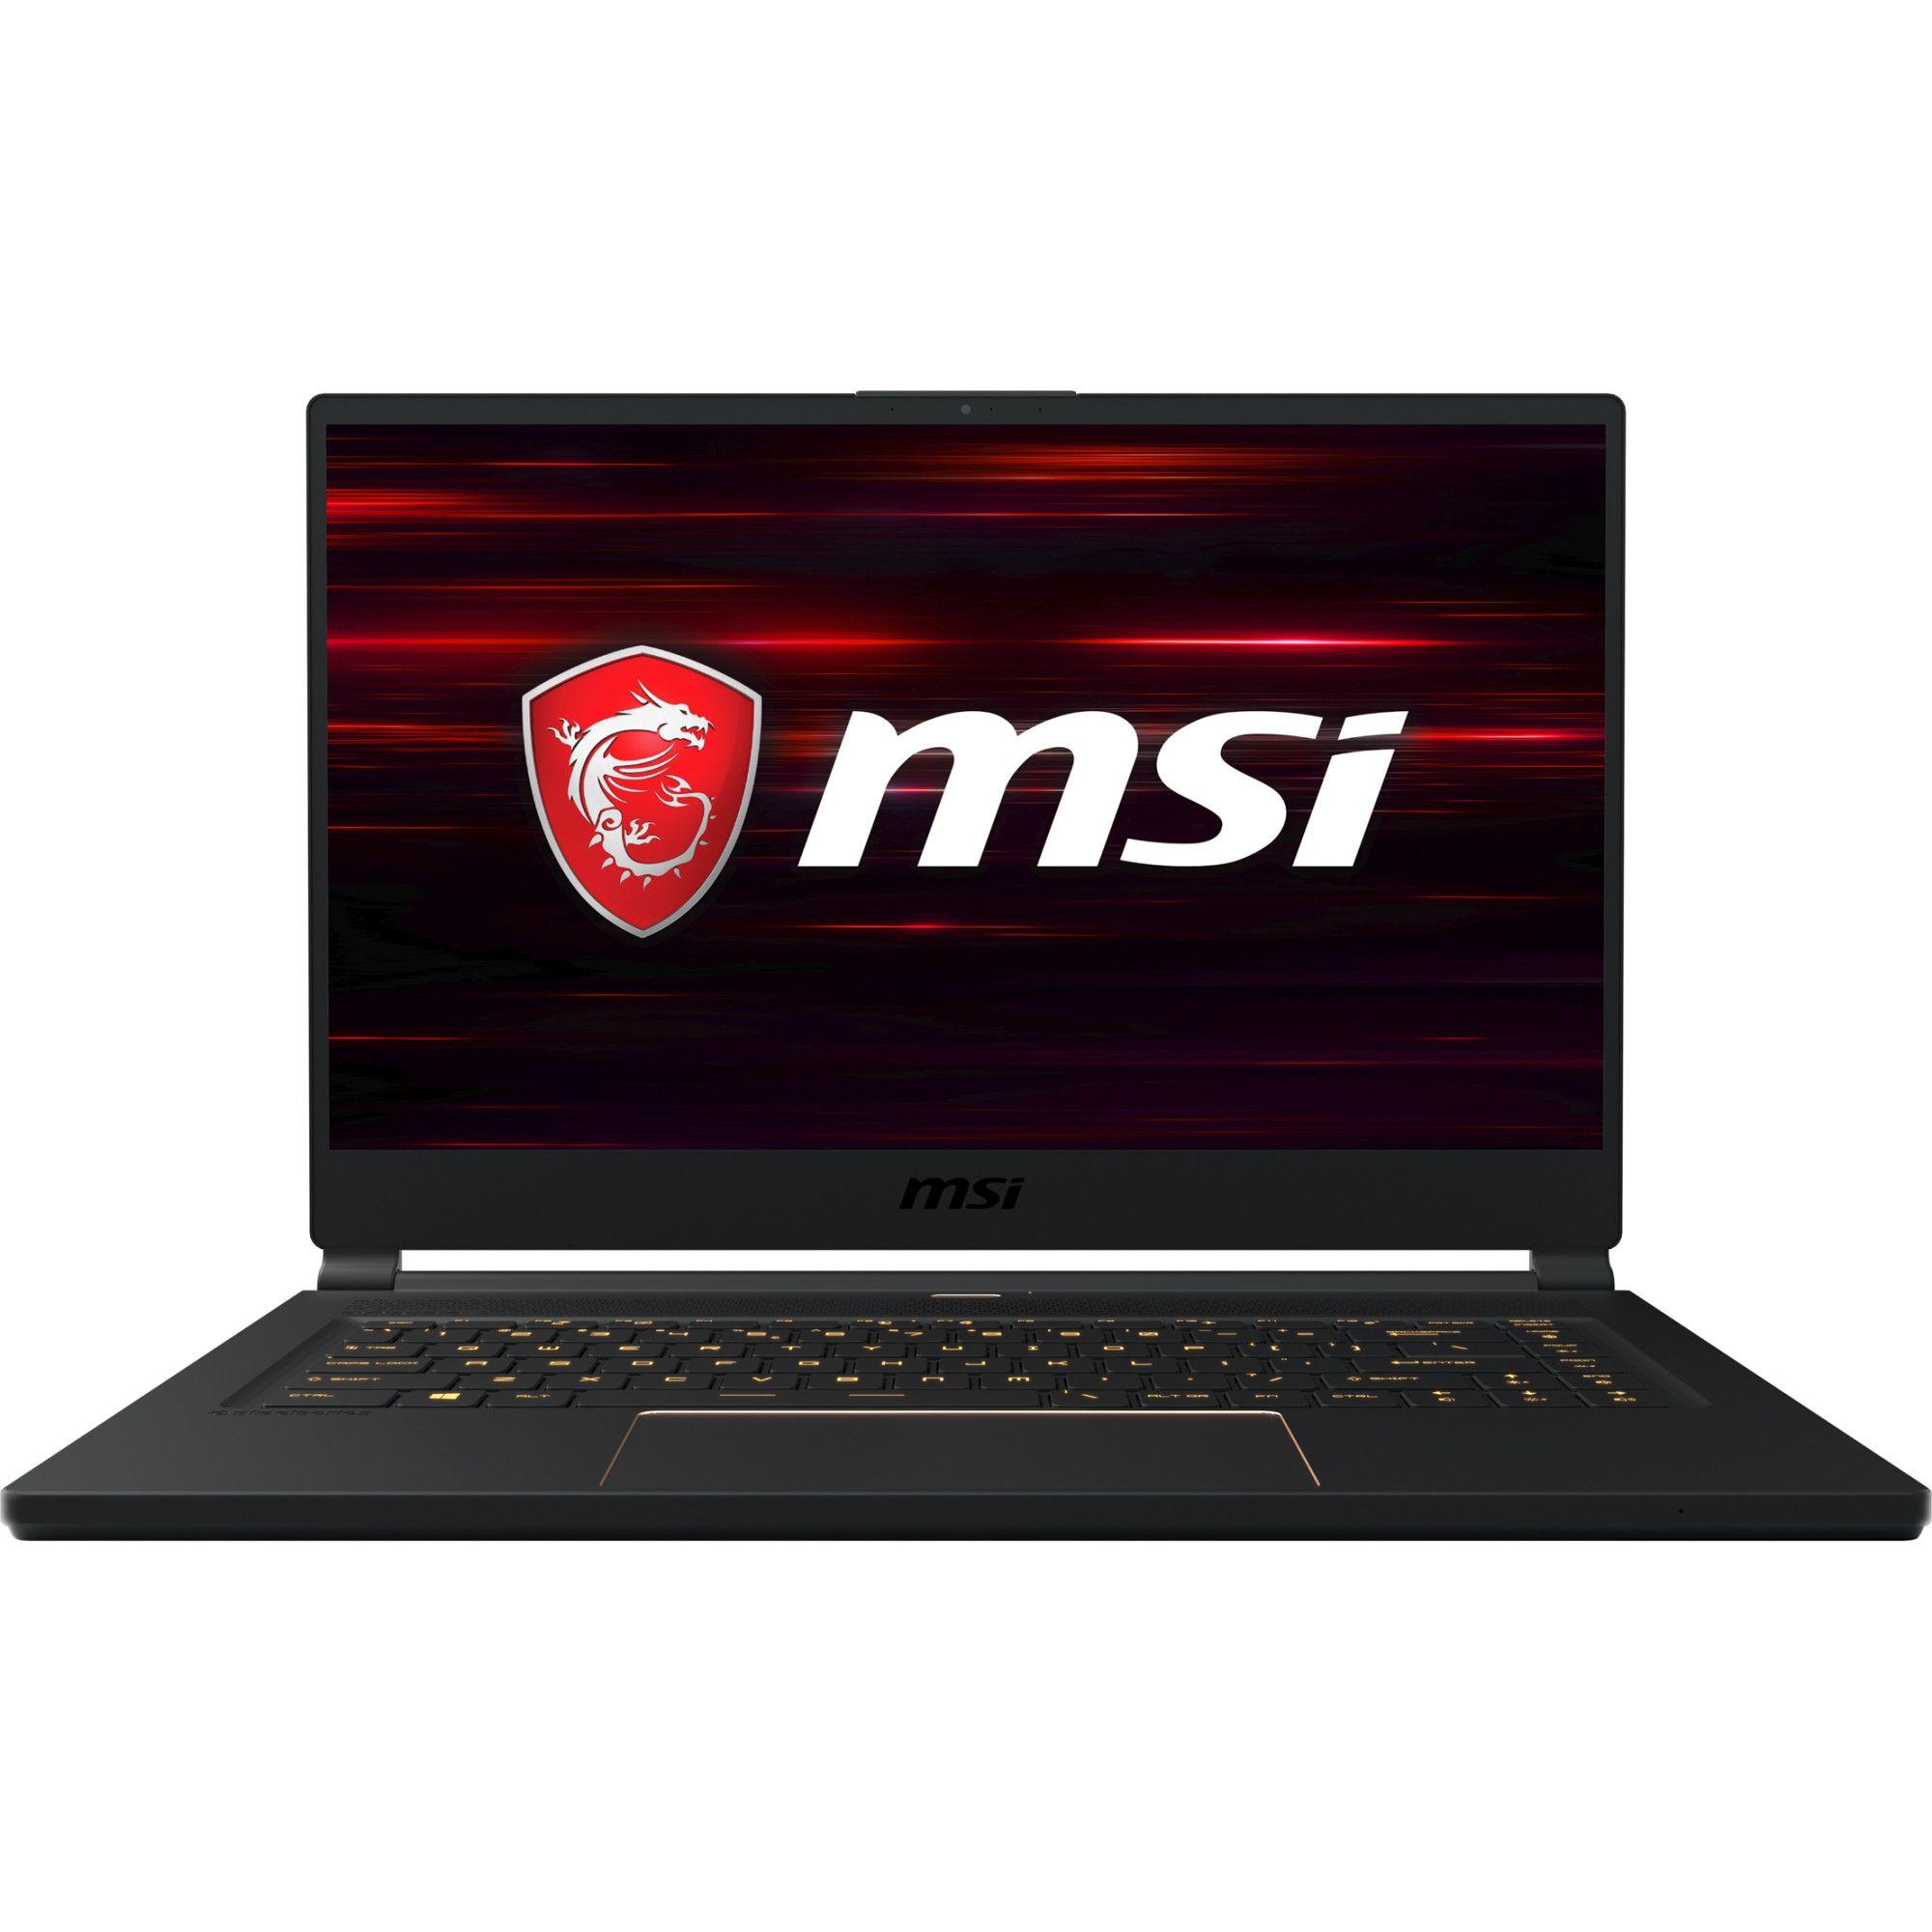 Notebook MSI GS65 Stealth 8SF 15.6 Full HD Intel Core i7-8750H RTX 2070-8GB RAM 16GB SSD 512GB Windows 10 Home Advanced